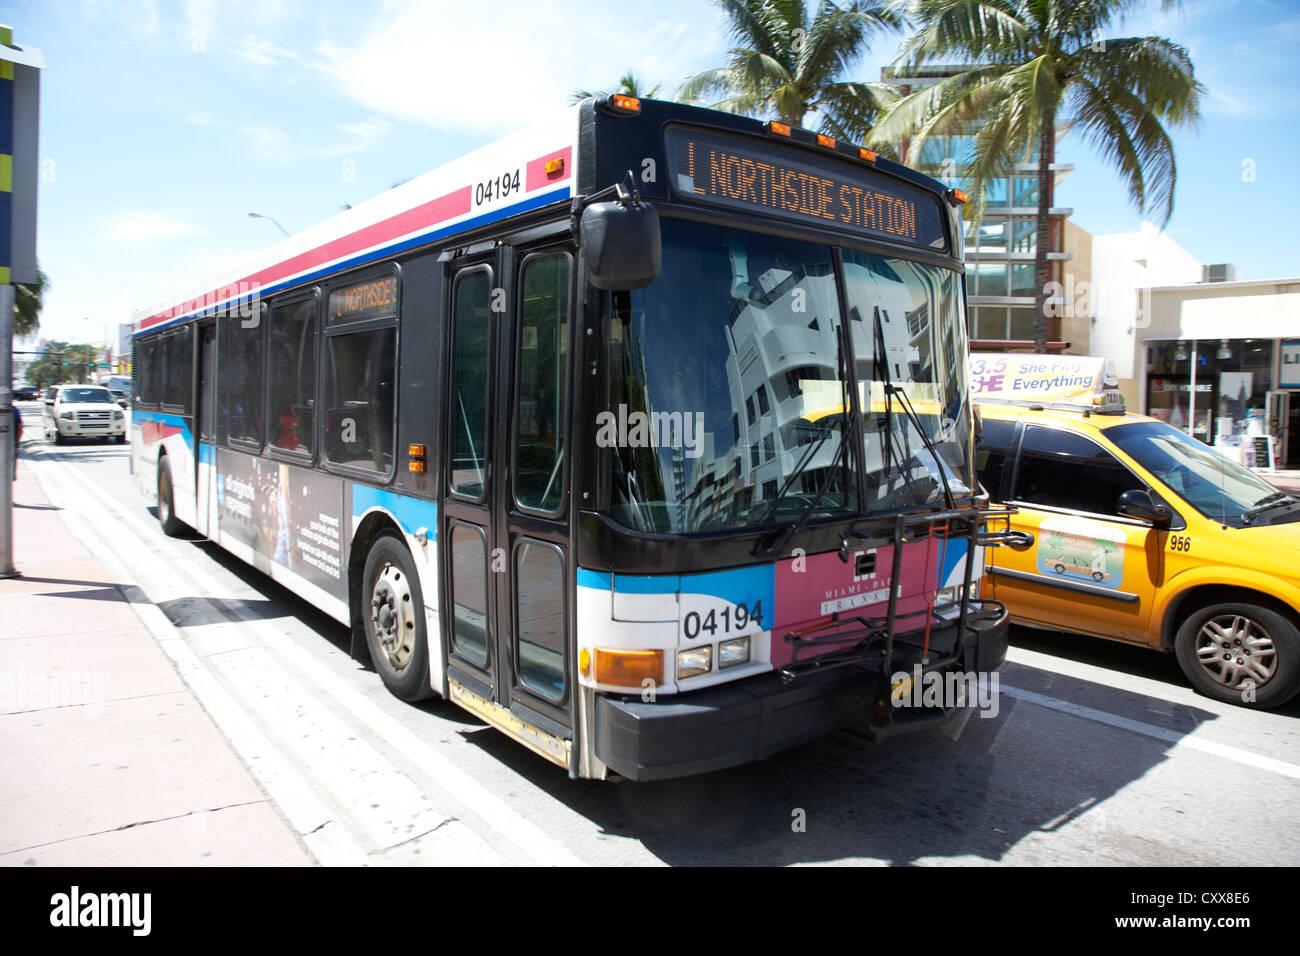 miami-dade transit public bus transport miami south beach